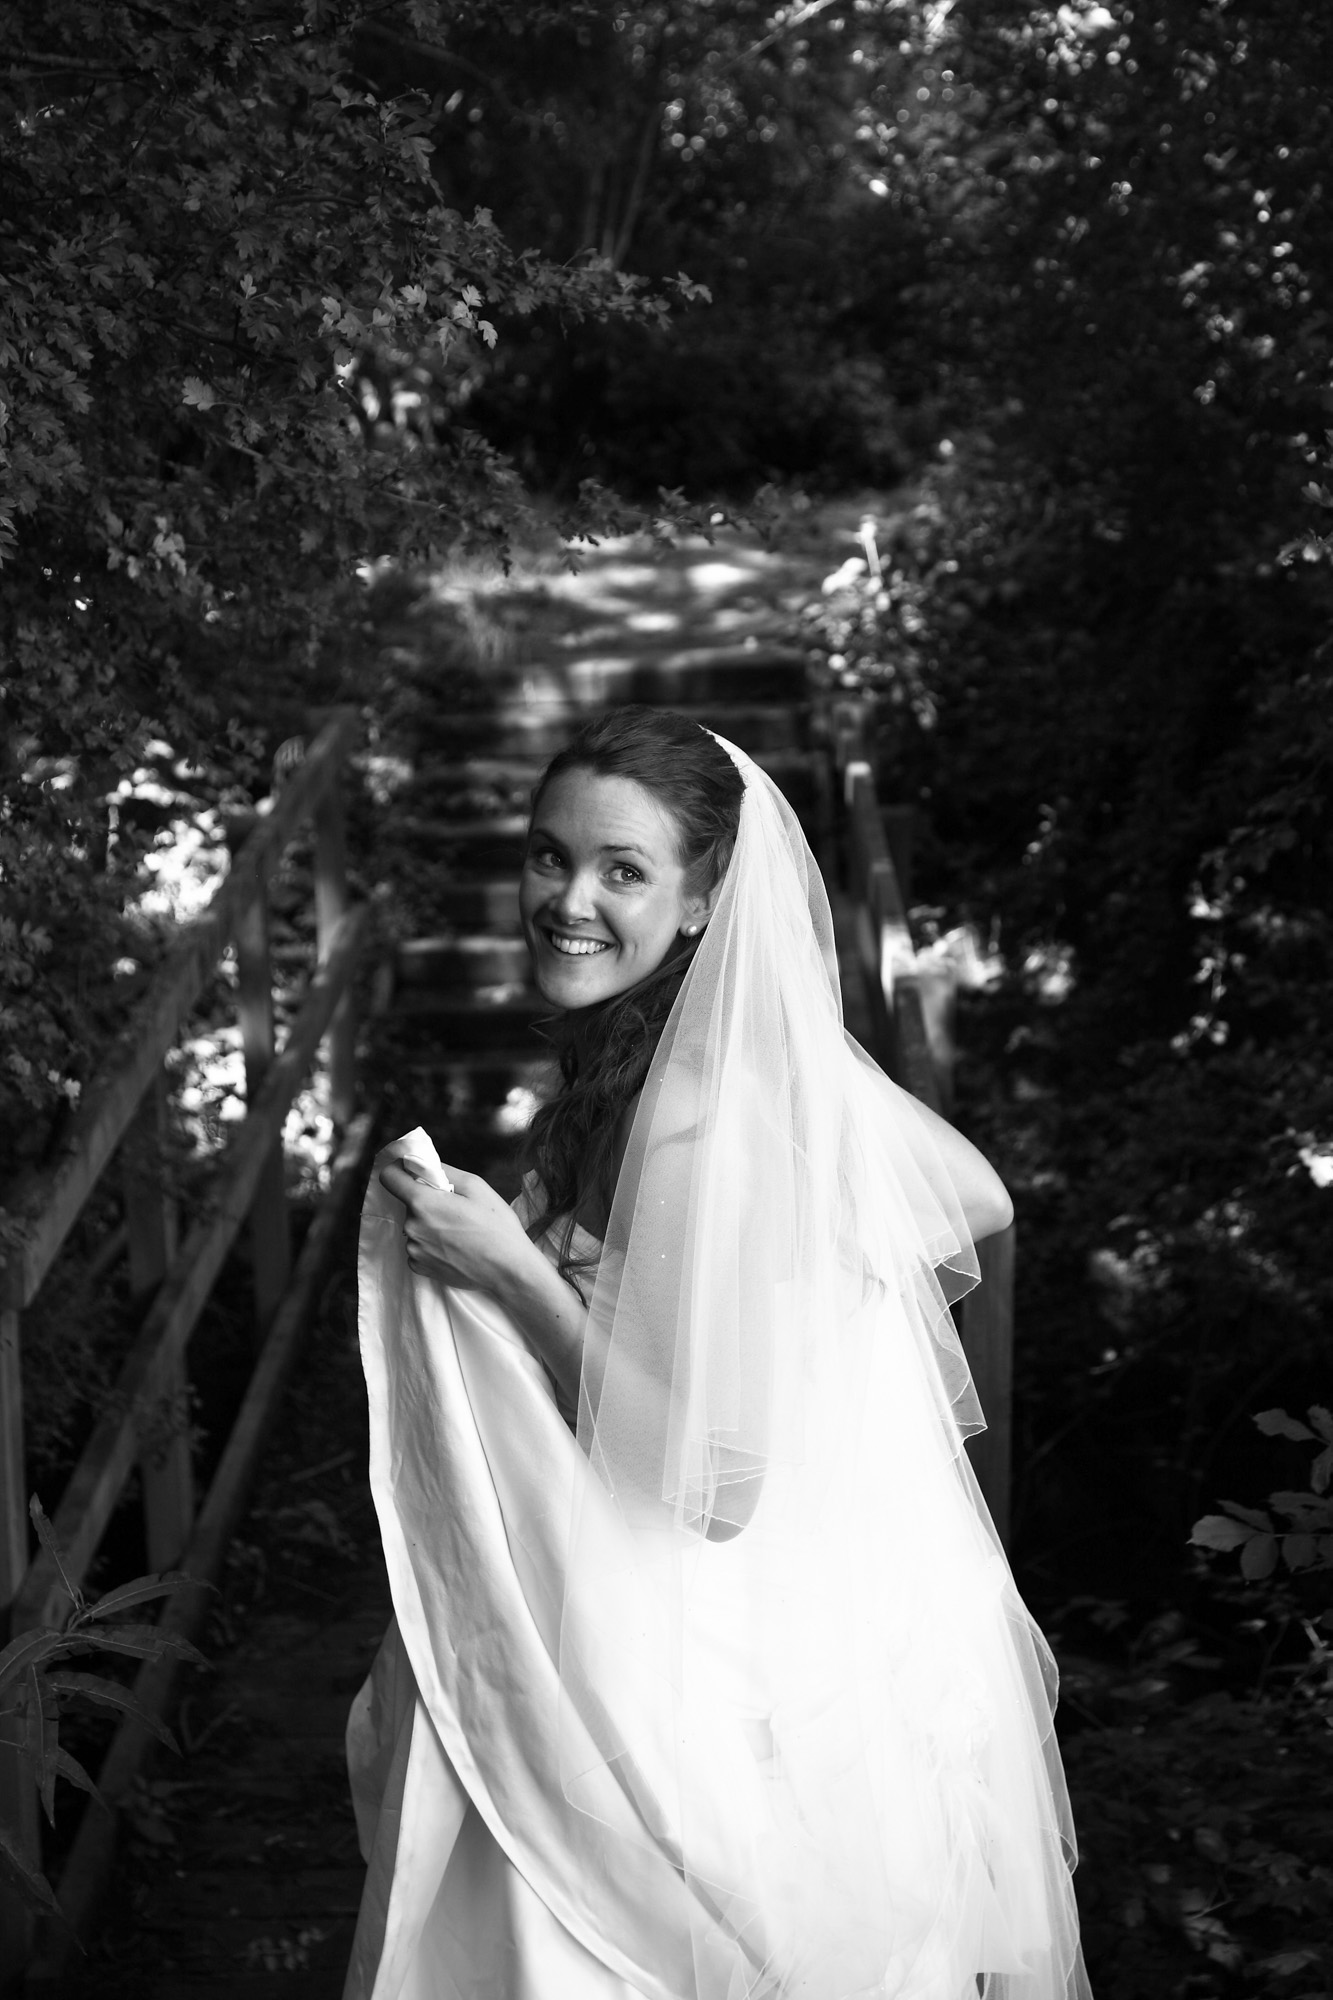 weddings-couples-love-photographer-oxford-london-jonathan-self-photography-84.jpg